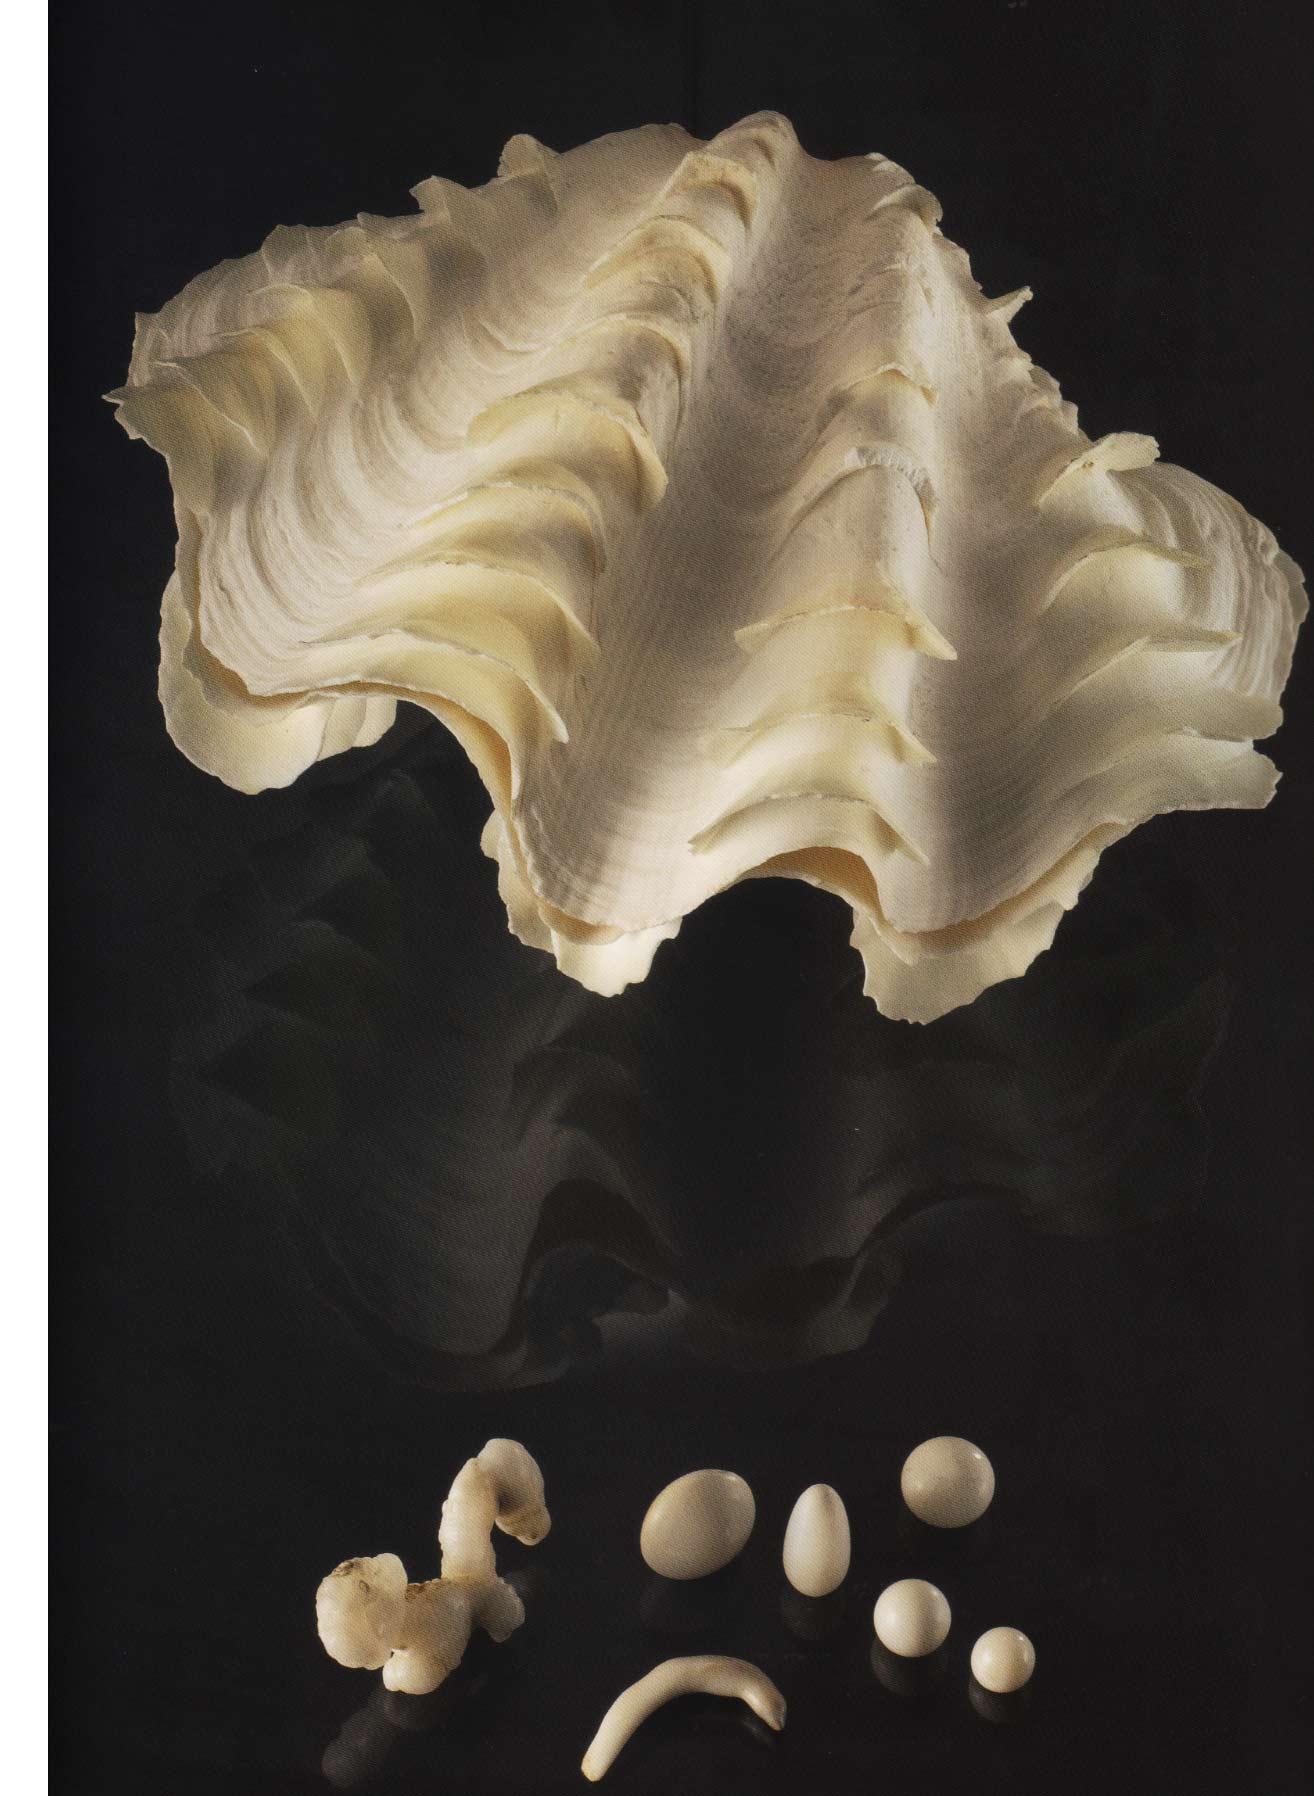 Perles de tridacne et son mollusque, le tridacna gigas